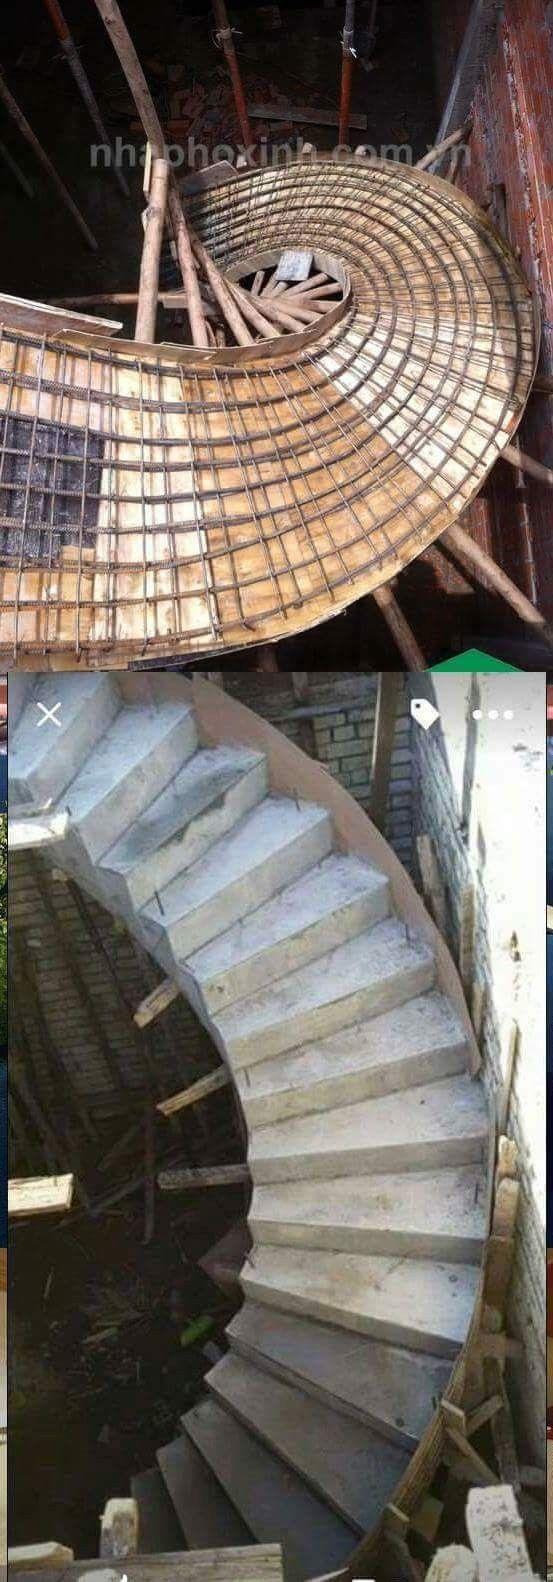 Pin de alvaro inga en escaleras en 2019 escaleras for Construccion de estanques circulares para tilapia